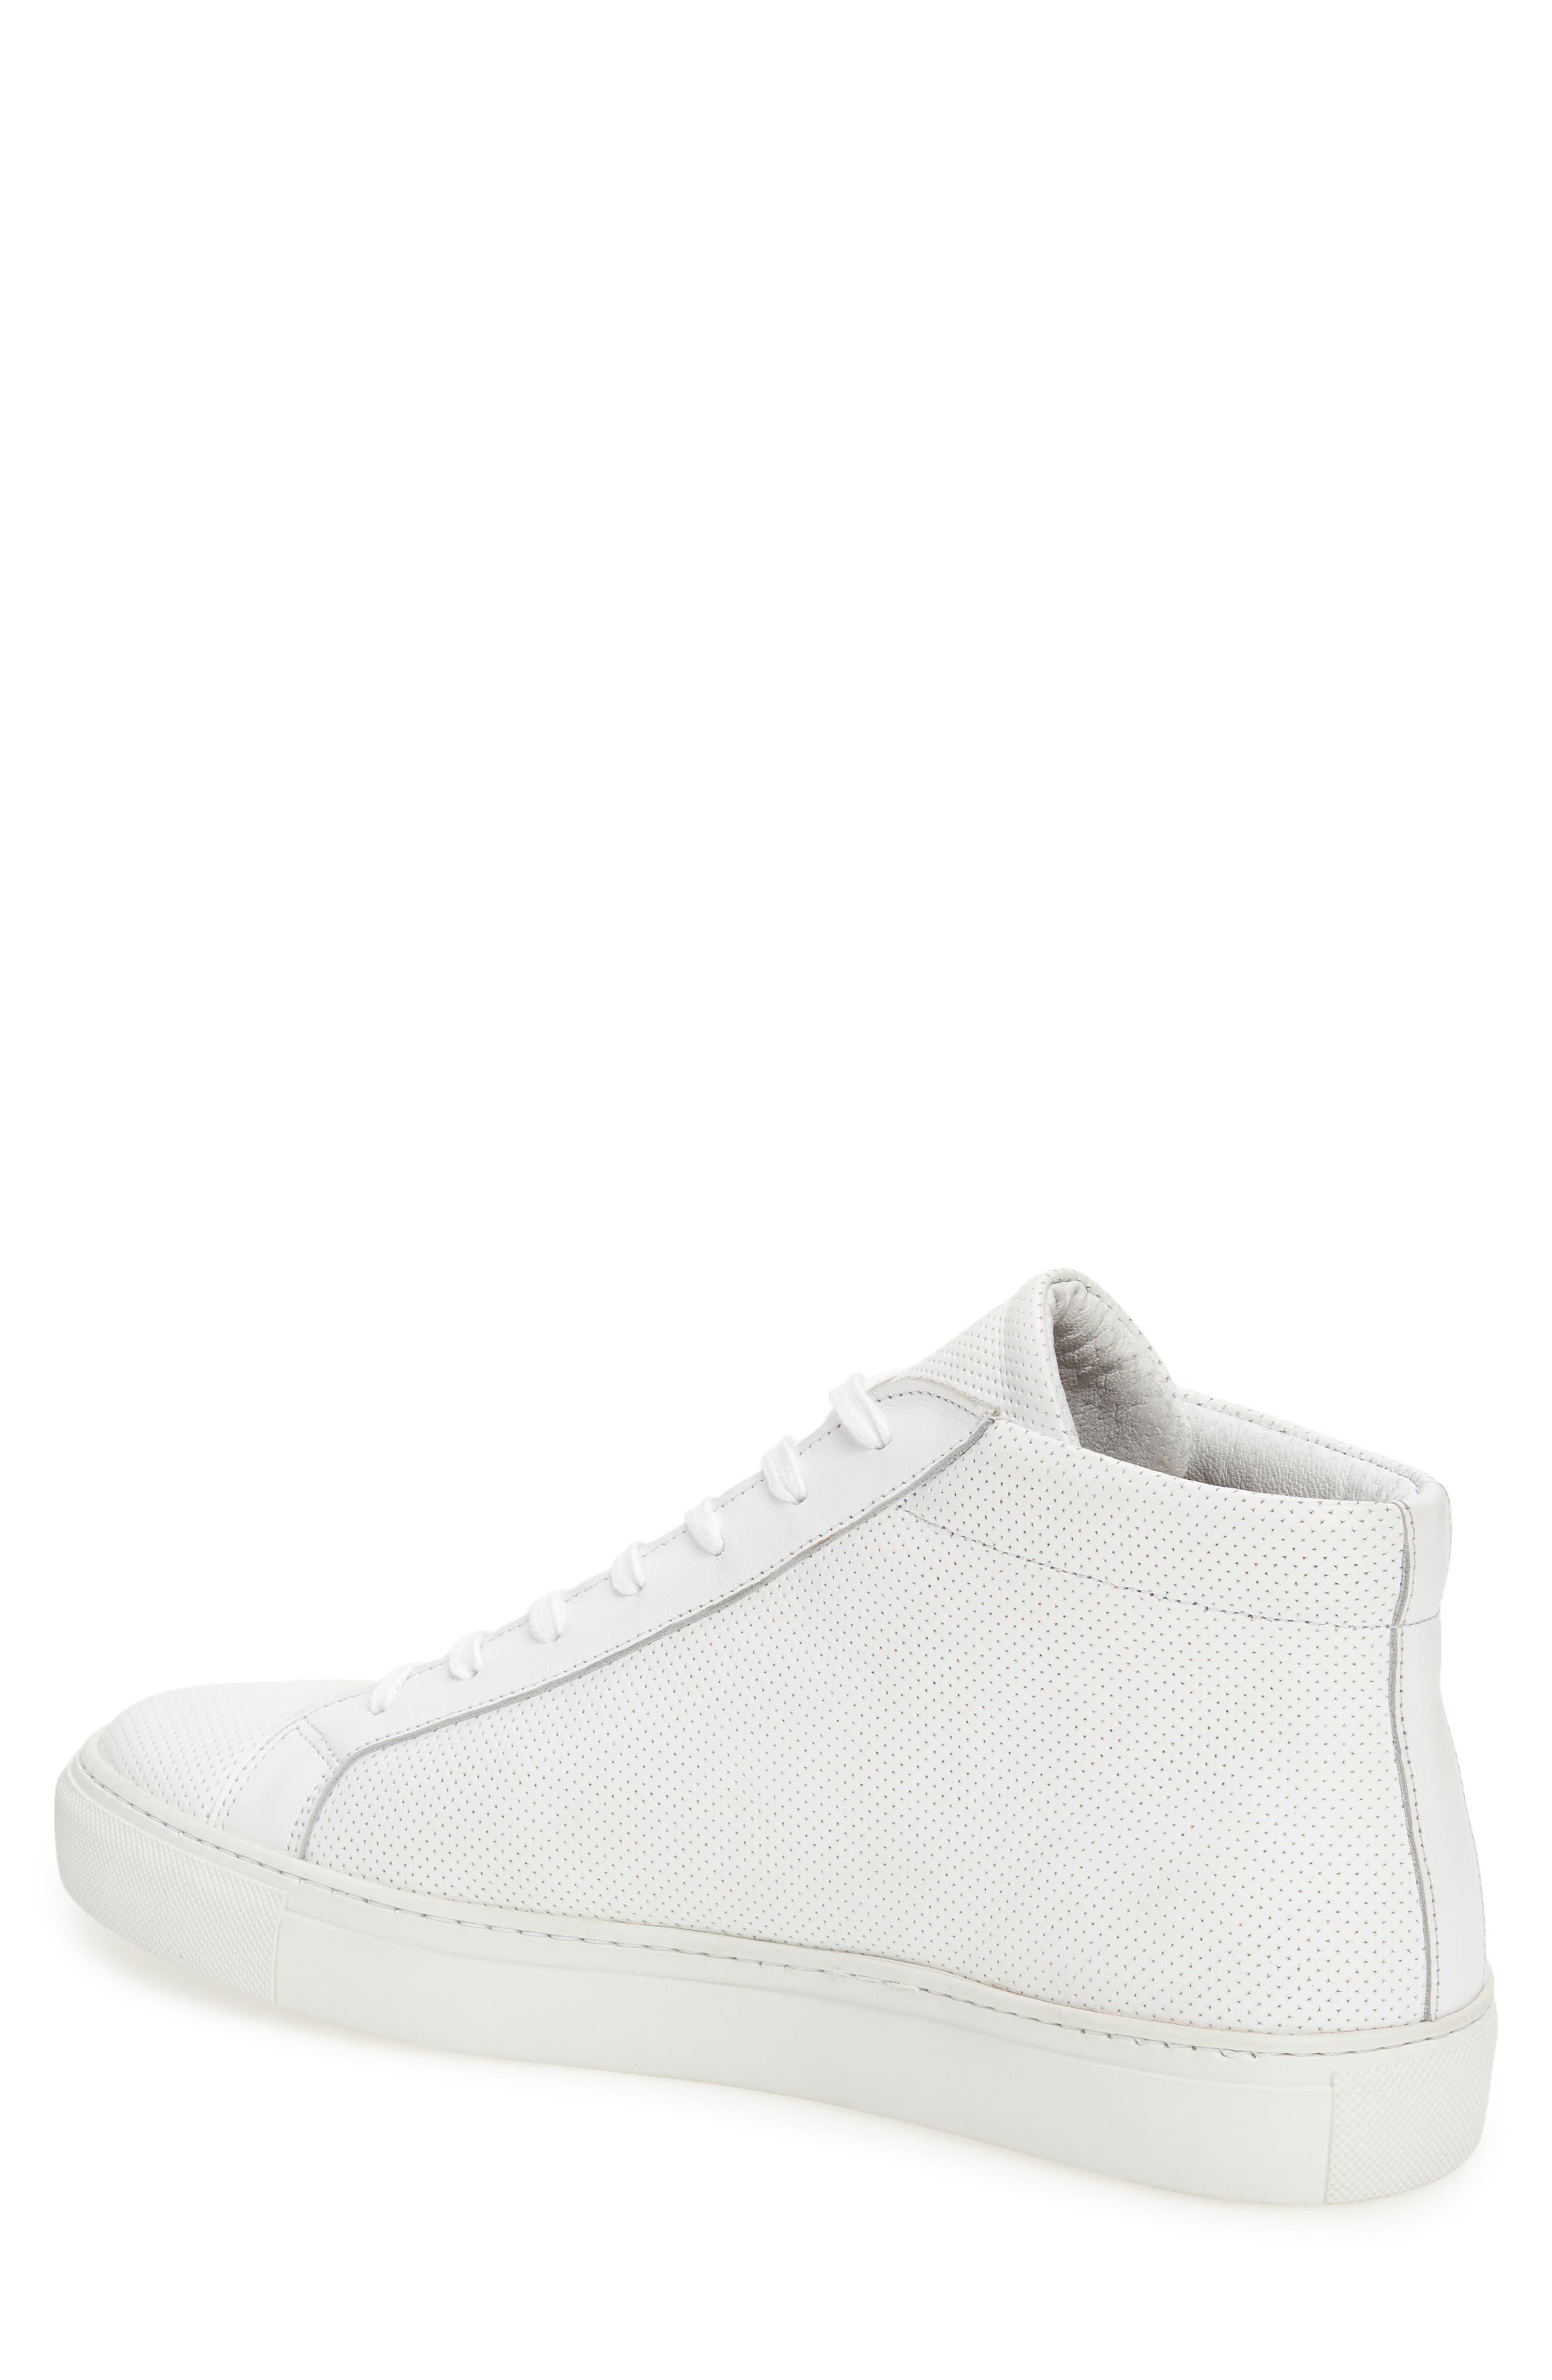 ,                             Deacon Mid Sneaker,                             Alternate thumbnail 14, color,                             100